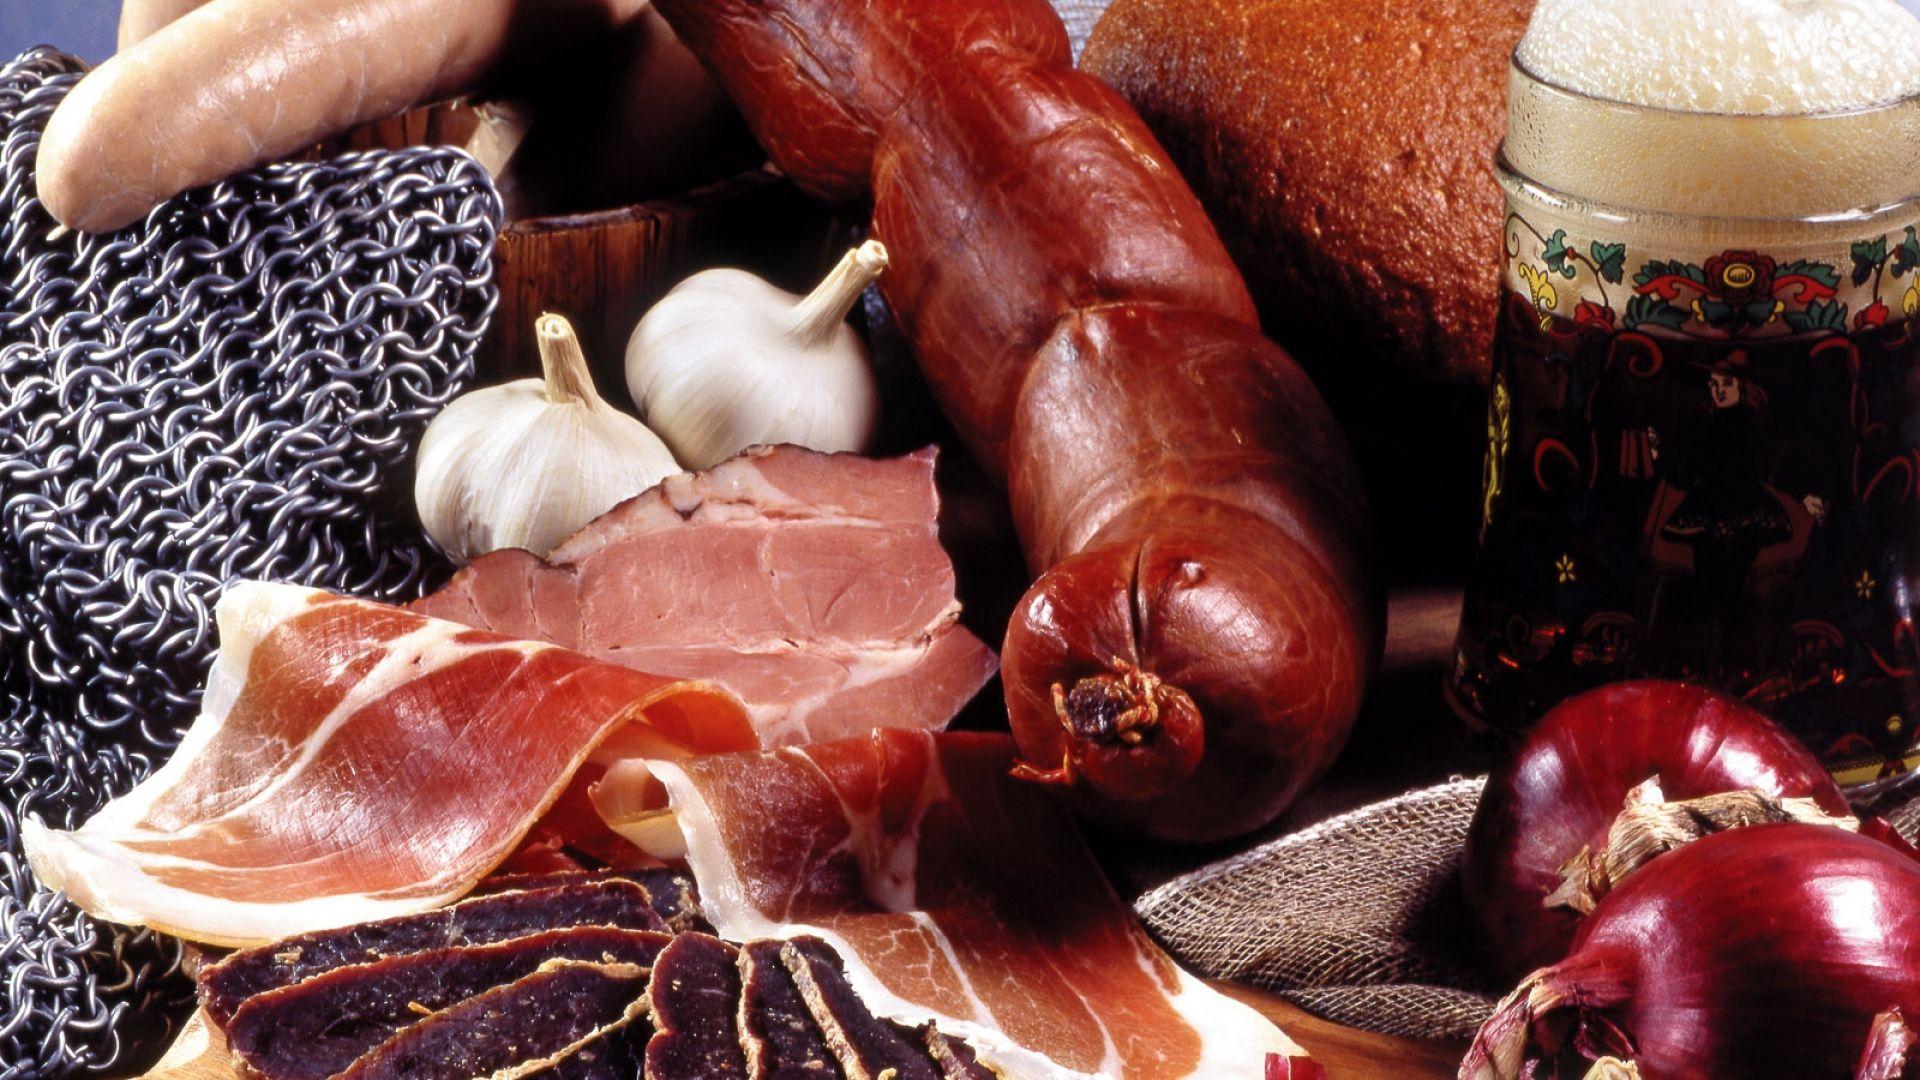 sausage, allsorts, onions - http://www.wallpapers4u.org/sausage-allsorts-onions/